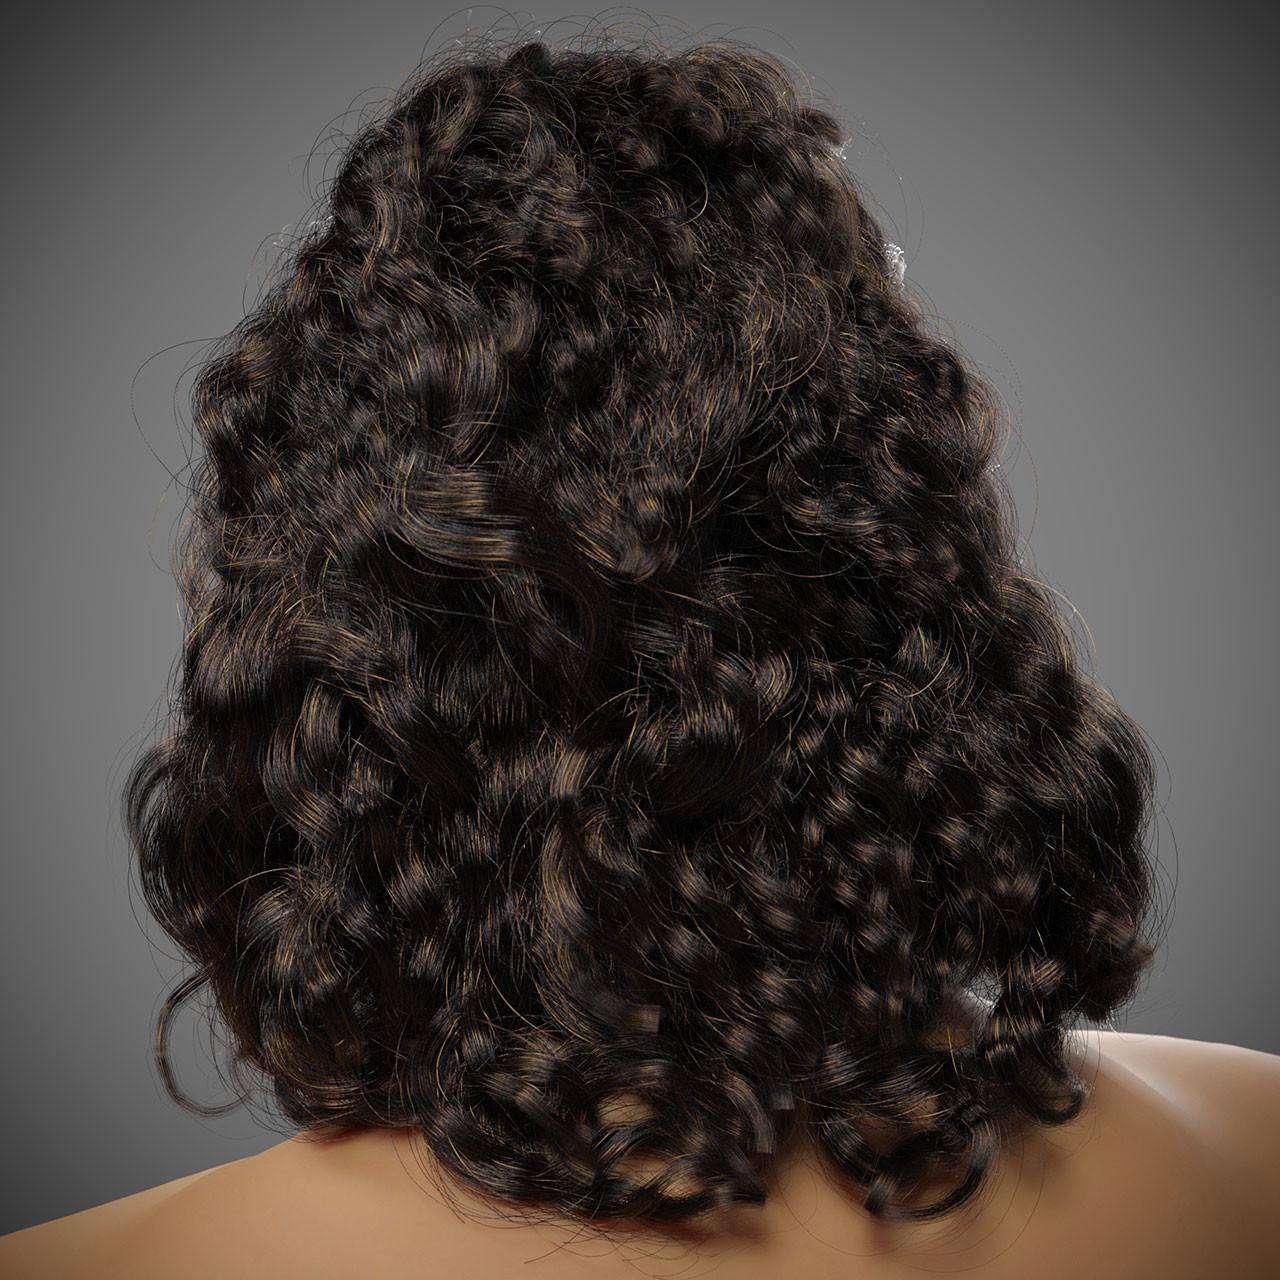 Andrew krivulya joseph hairstyle 1 r 07 by andrew krivulya